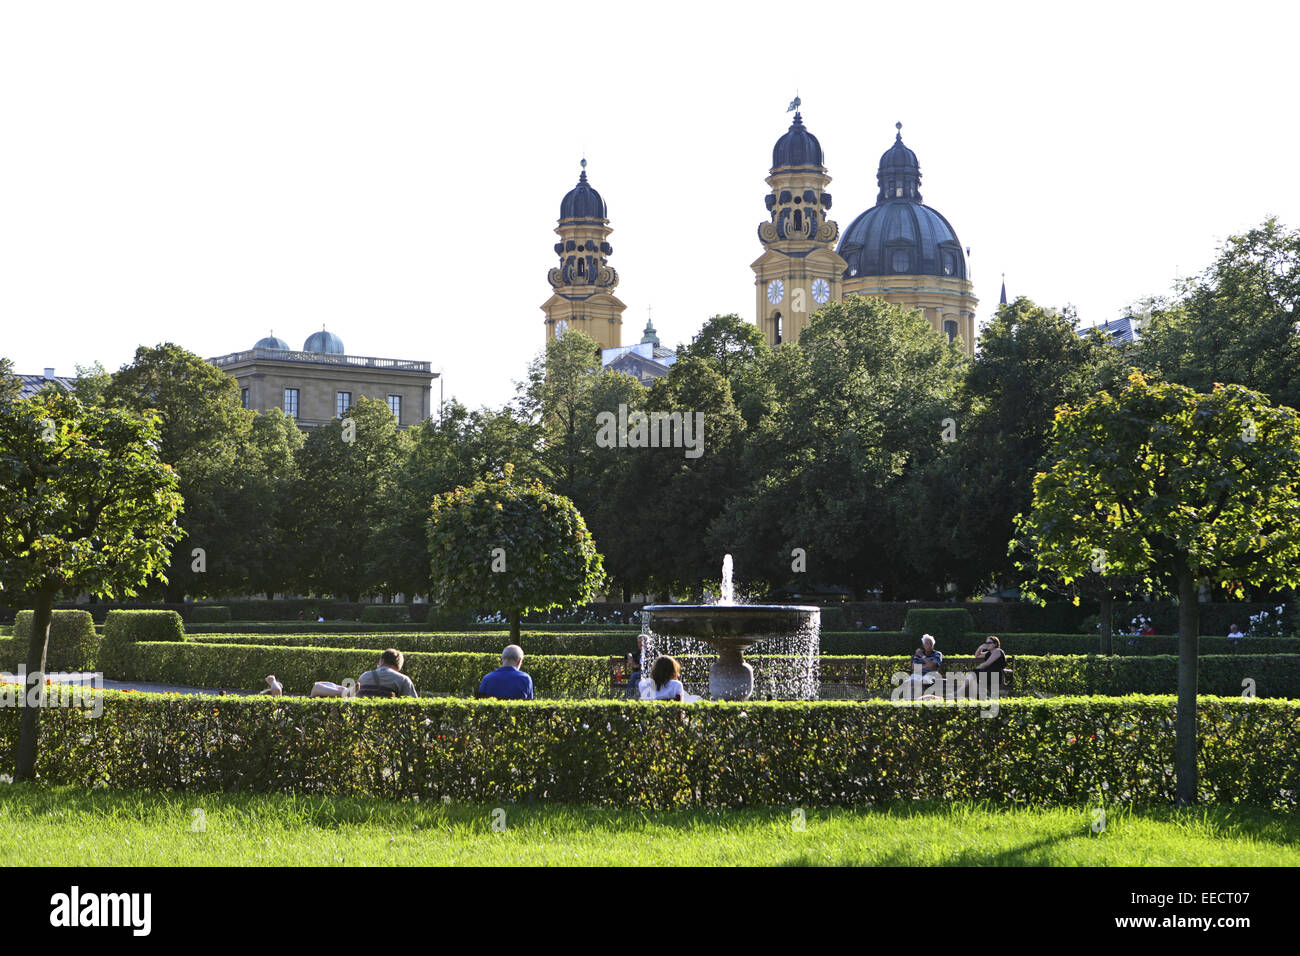 Architektur, Bauwerk, Bauwerke, Geschichte, Hofgarten, Landeshauptstadt, Oberbayern, Park, Parkanlage, Parkanlagen, - Stock Image